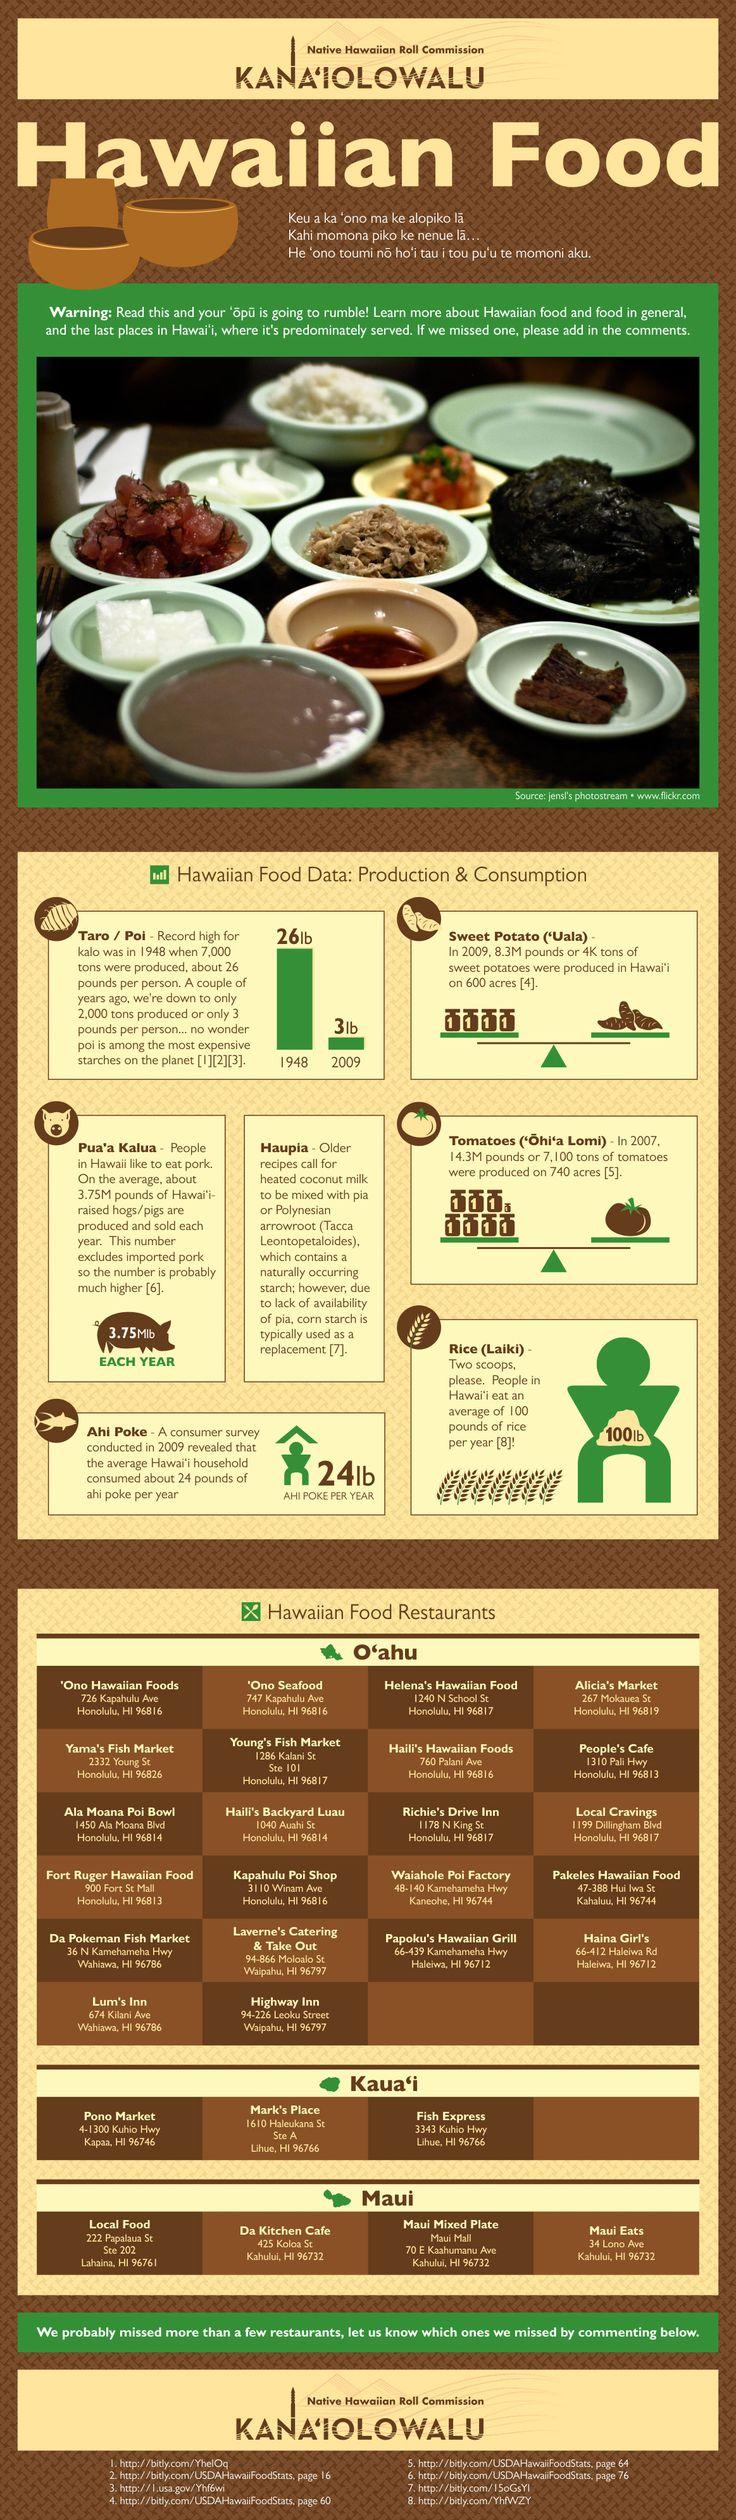 An Infographic about Hawaiian Food. Includes 3 great restaurants on Kauai.